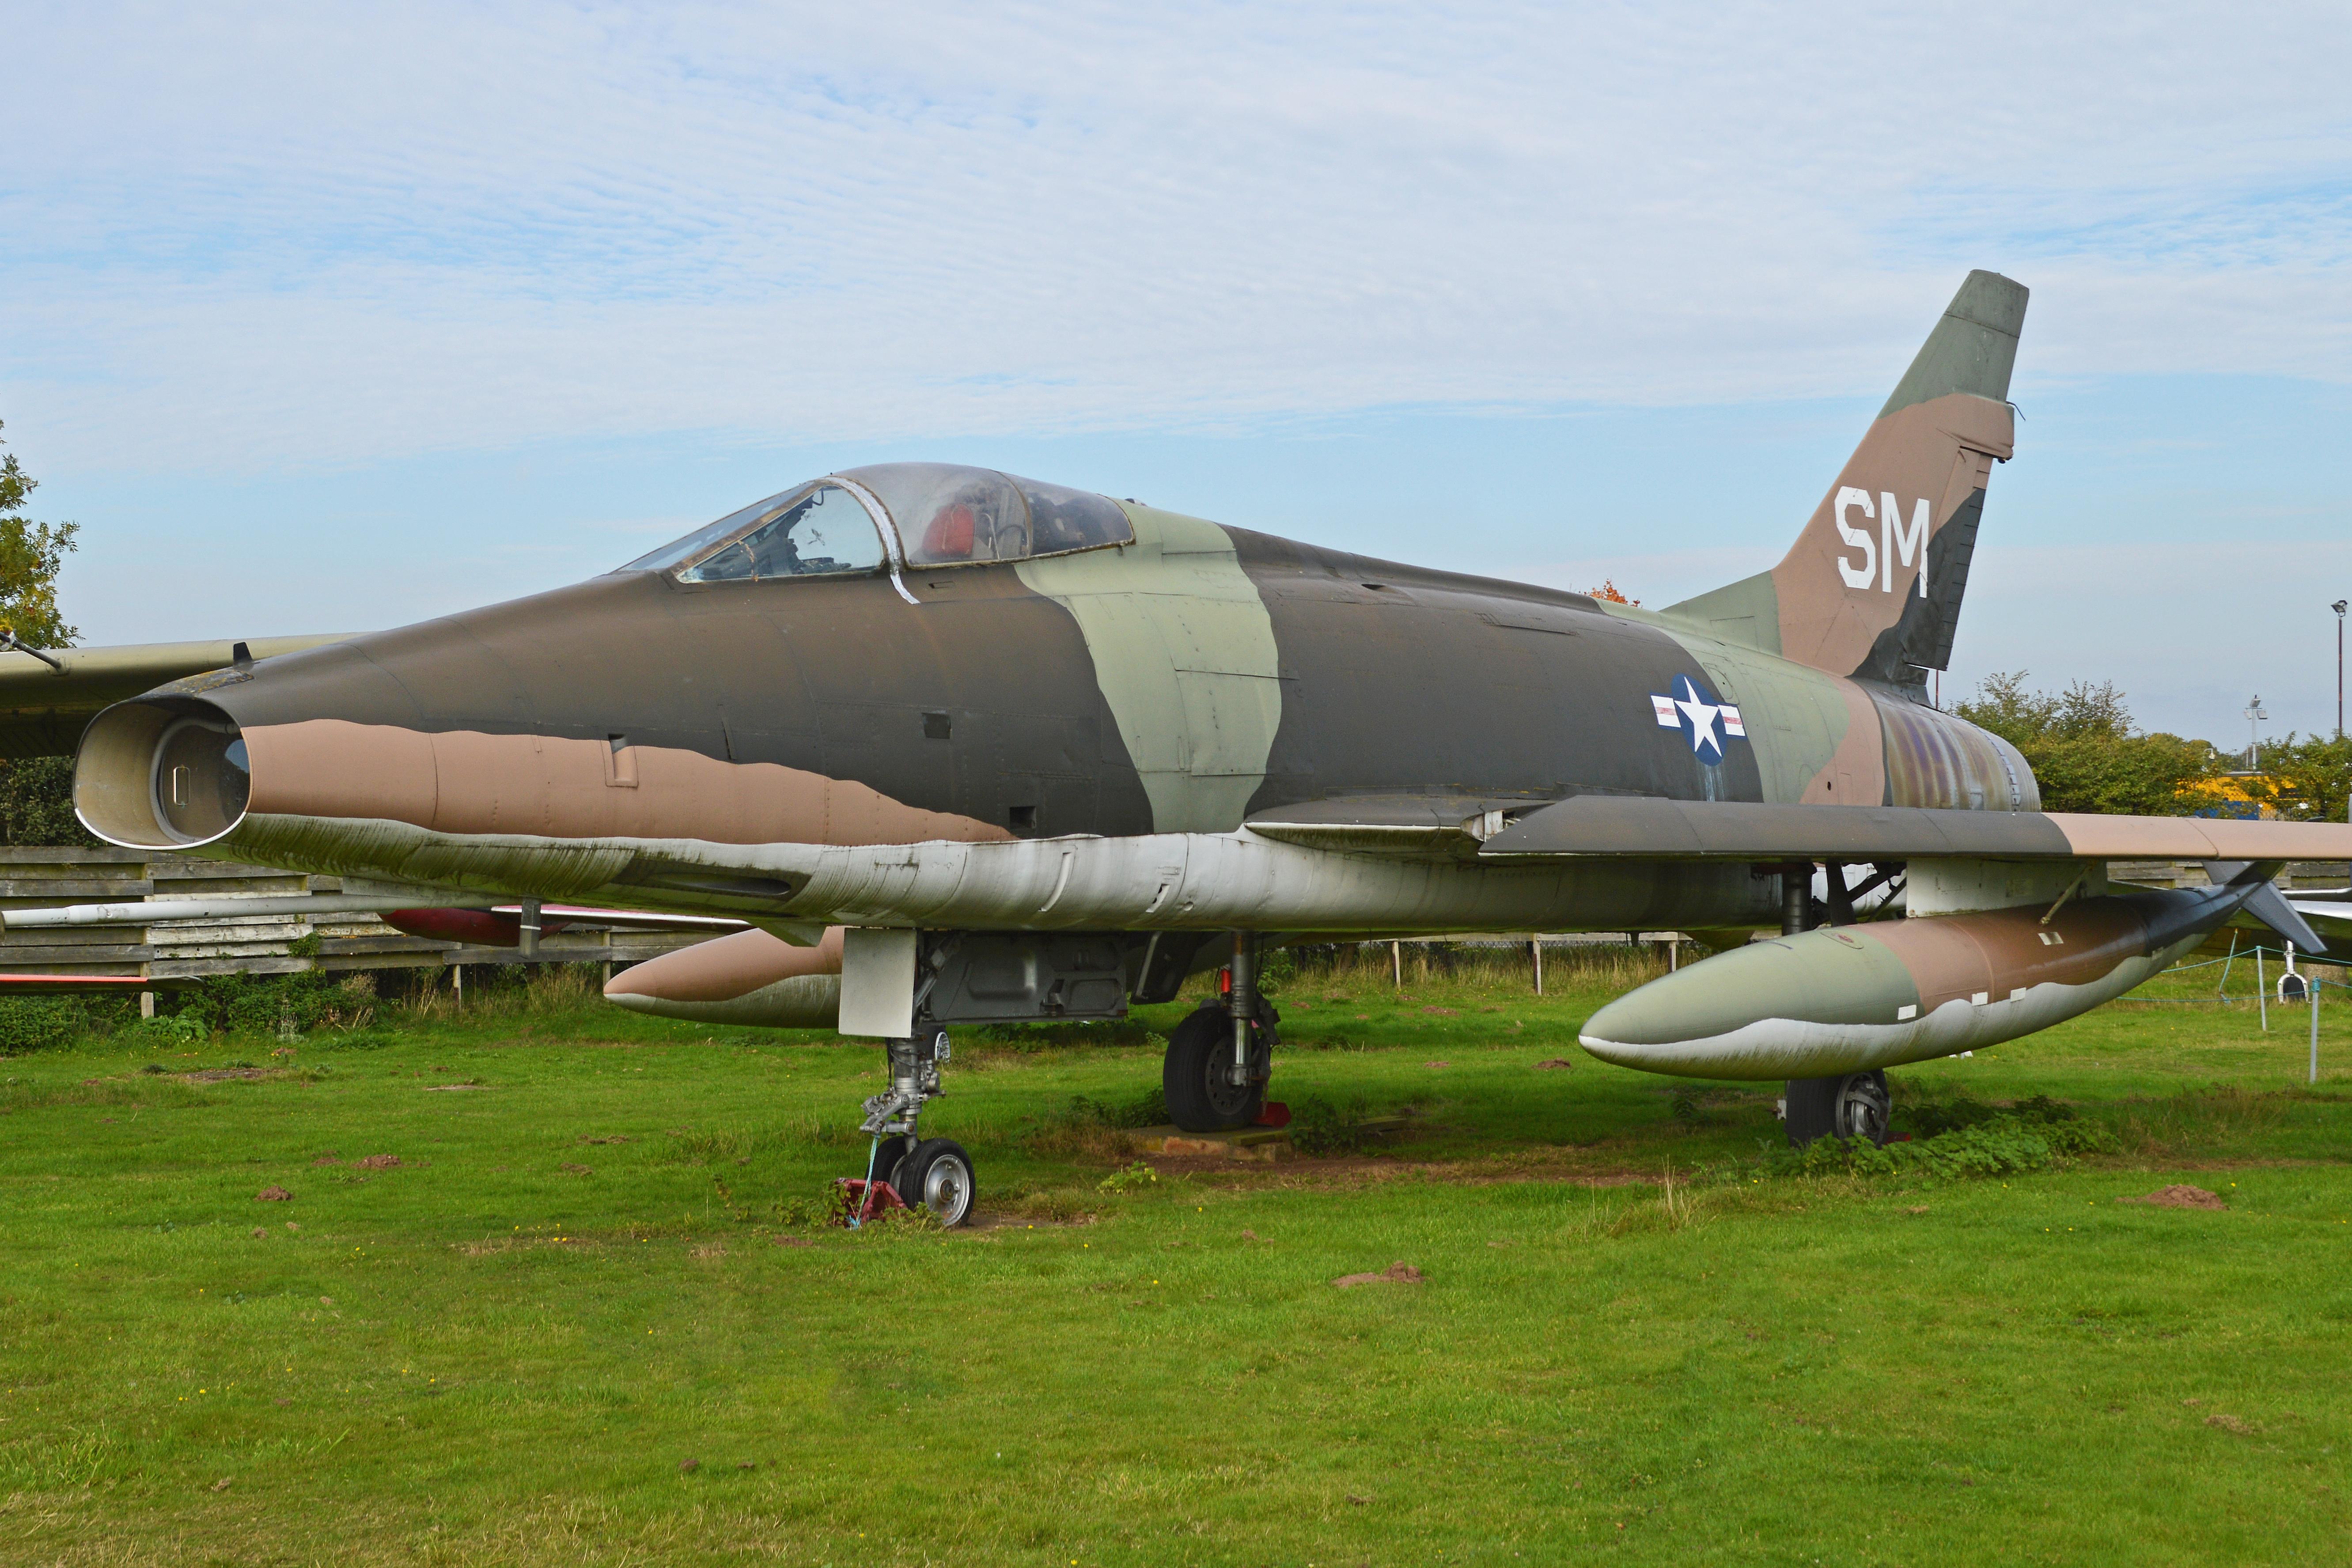 File:North American F-100D Super Sabre 'SM' (54-2174